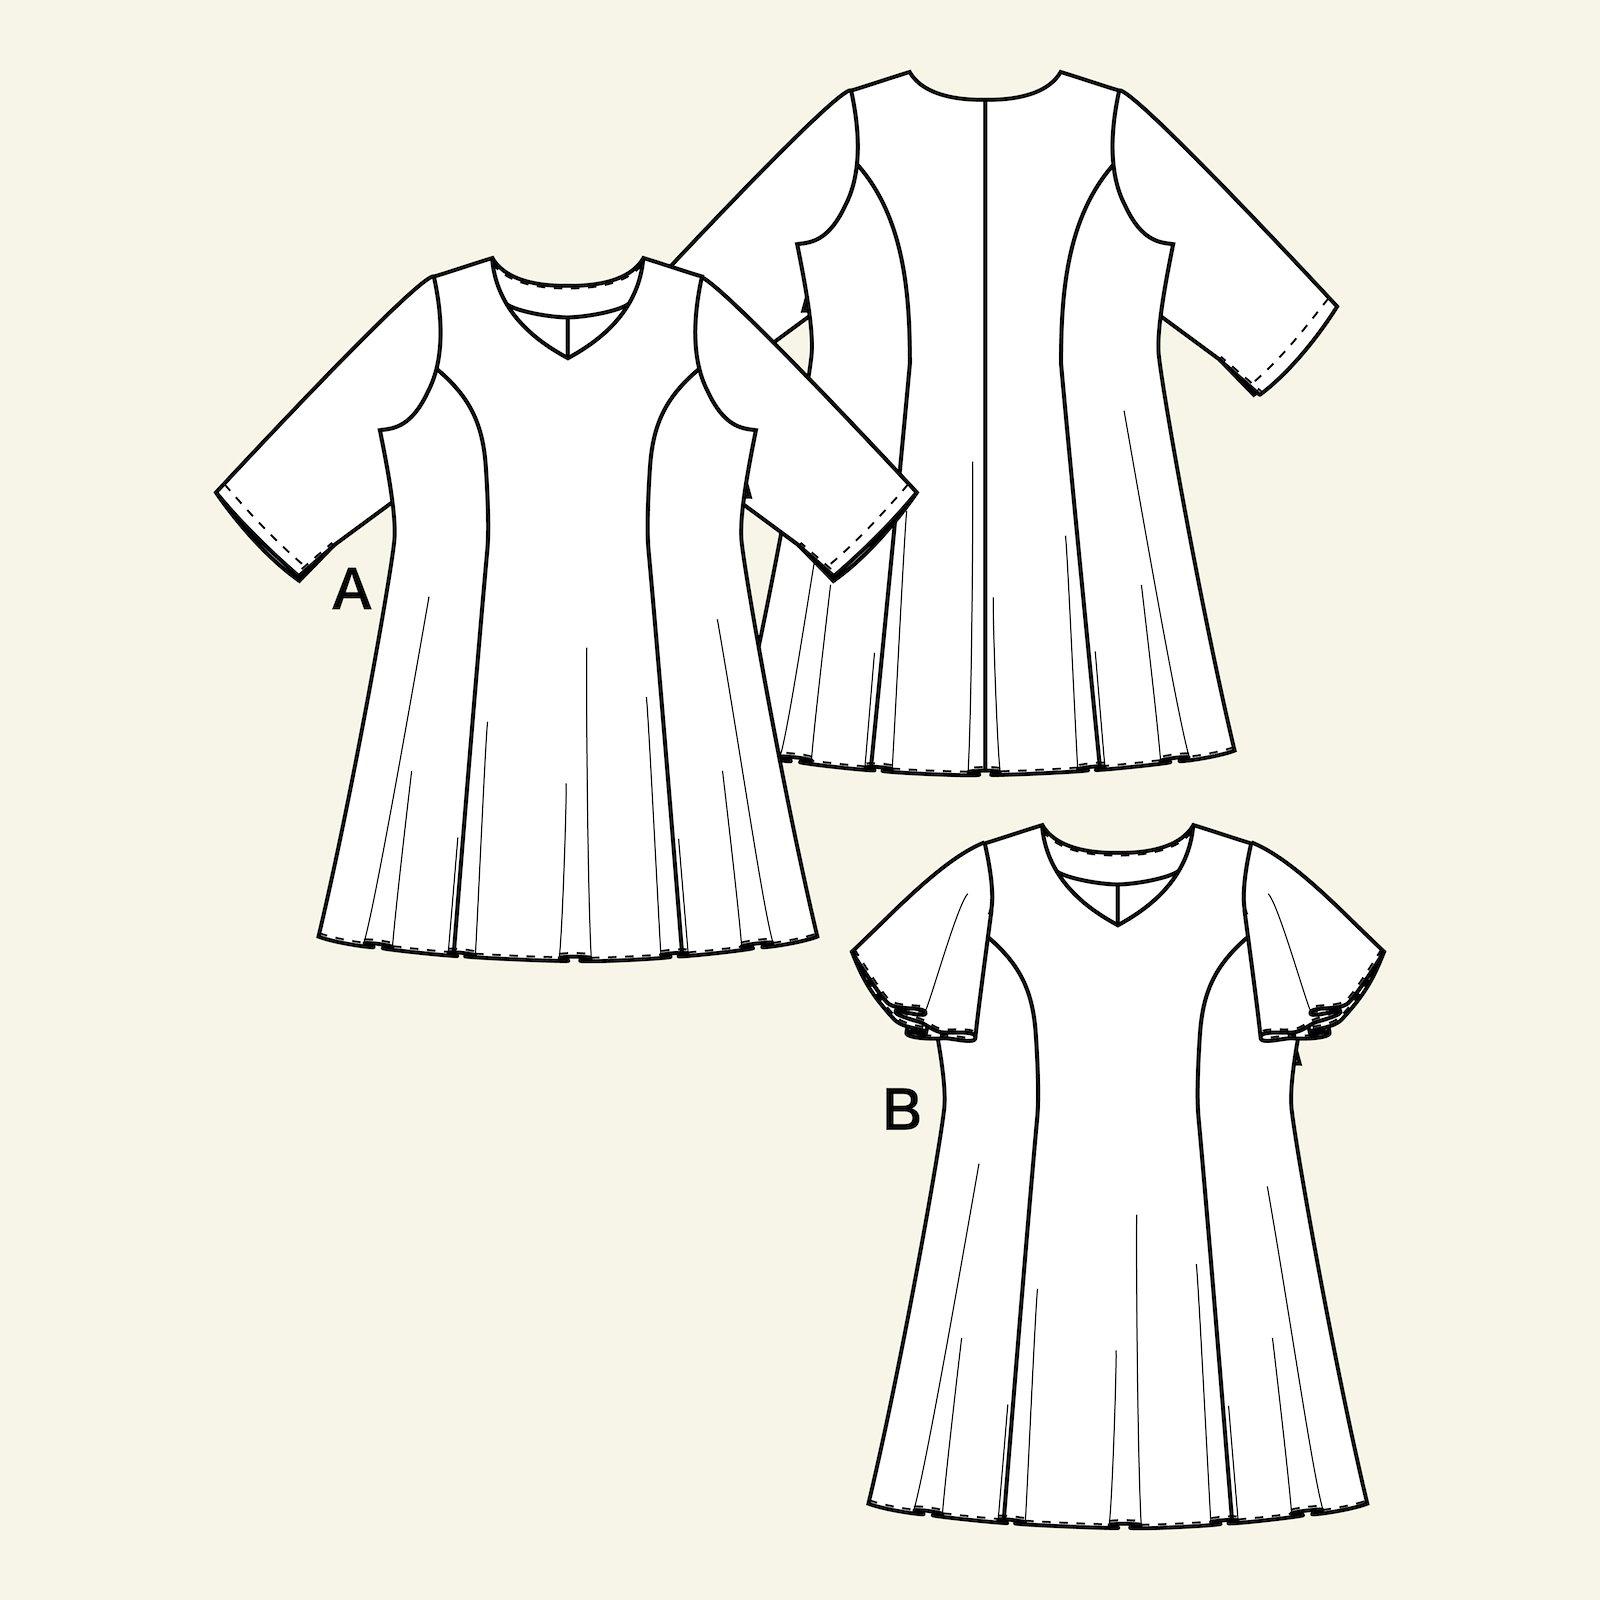 Dress with a princess cut, 58/30 p73016_pack